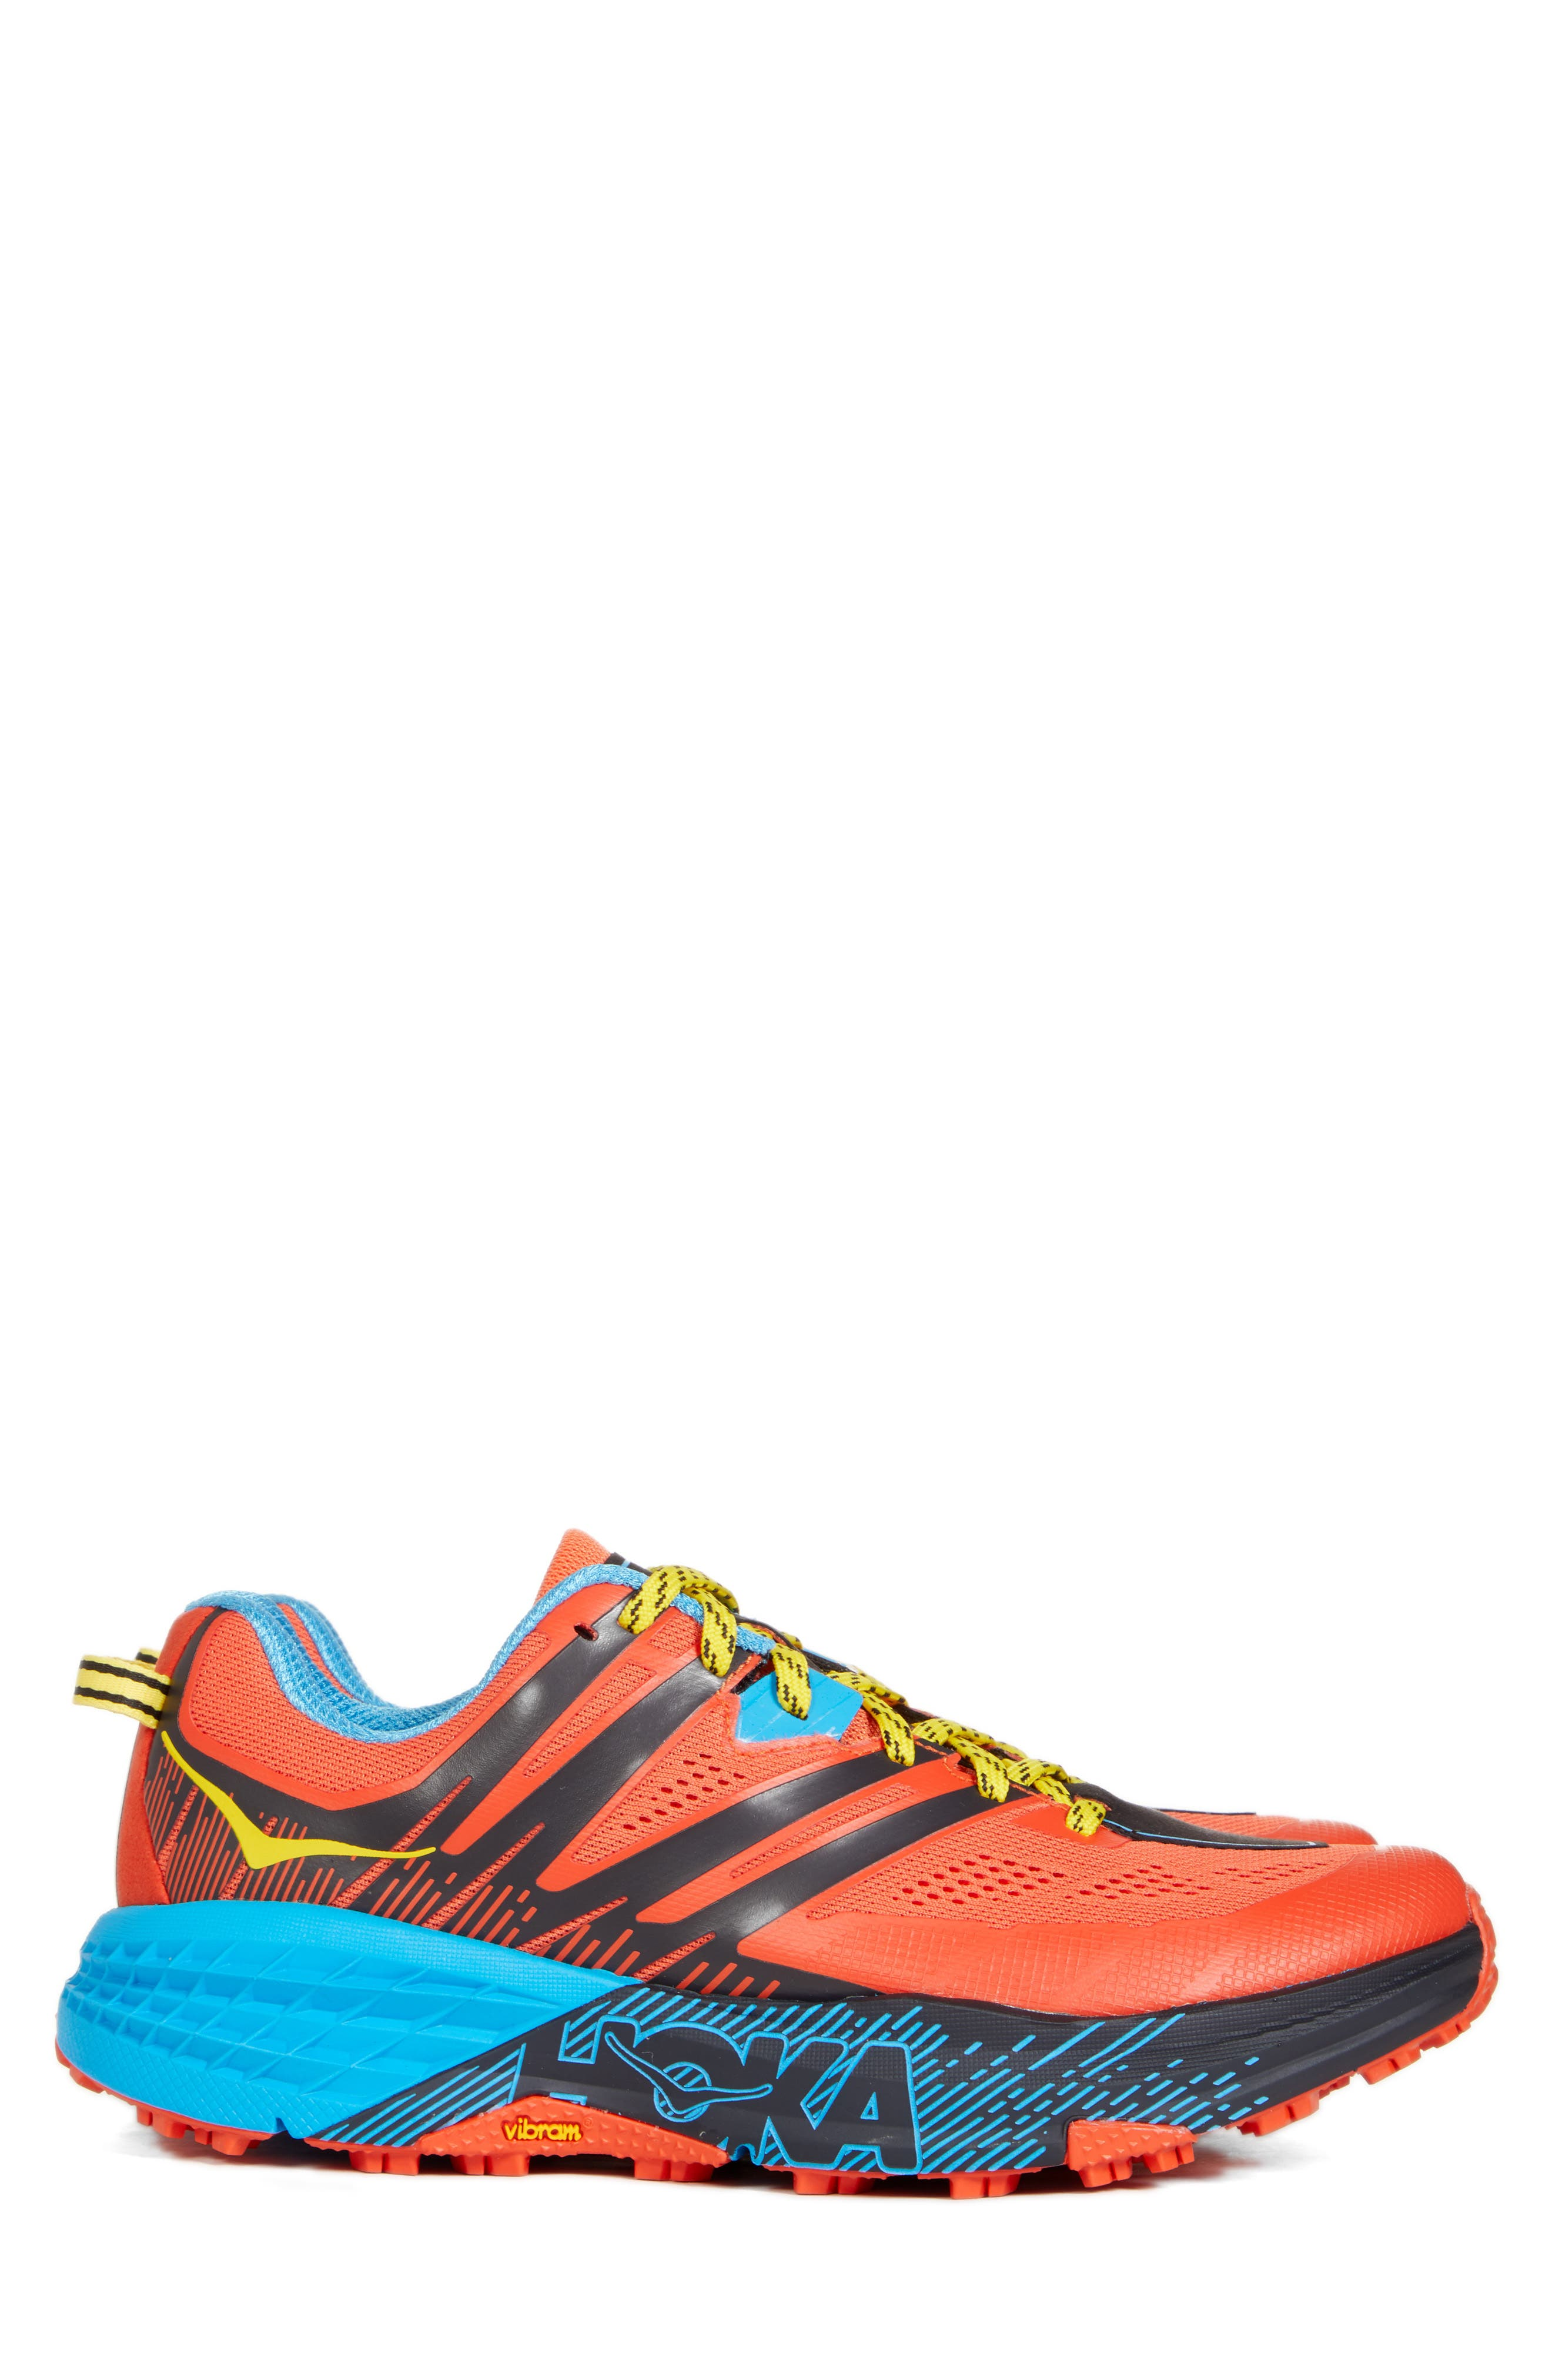 Speedgoat 3 Trail Running Shoe, Main, color, NASTURTIUM/ SPICY ORANGE